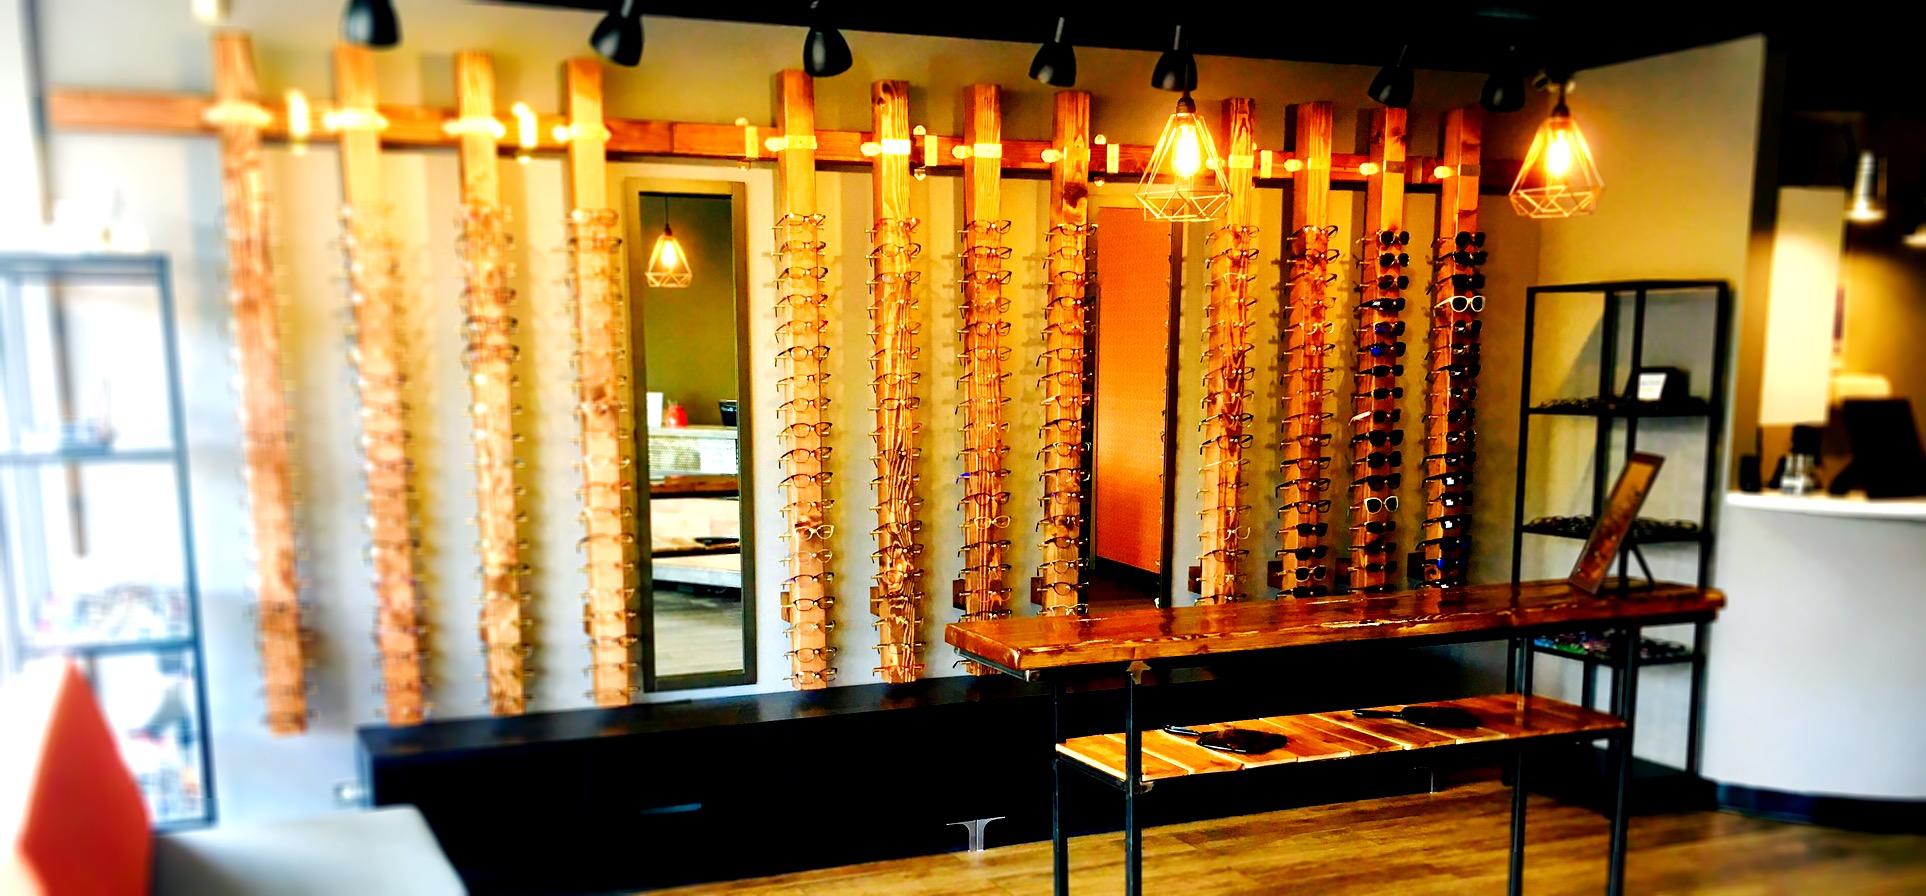 Optical, Eyewear, Eye Glasses, Frames & Lenses - Urban Eyes Vision Care Denver